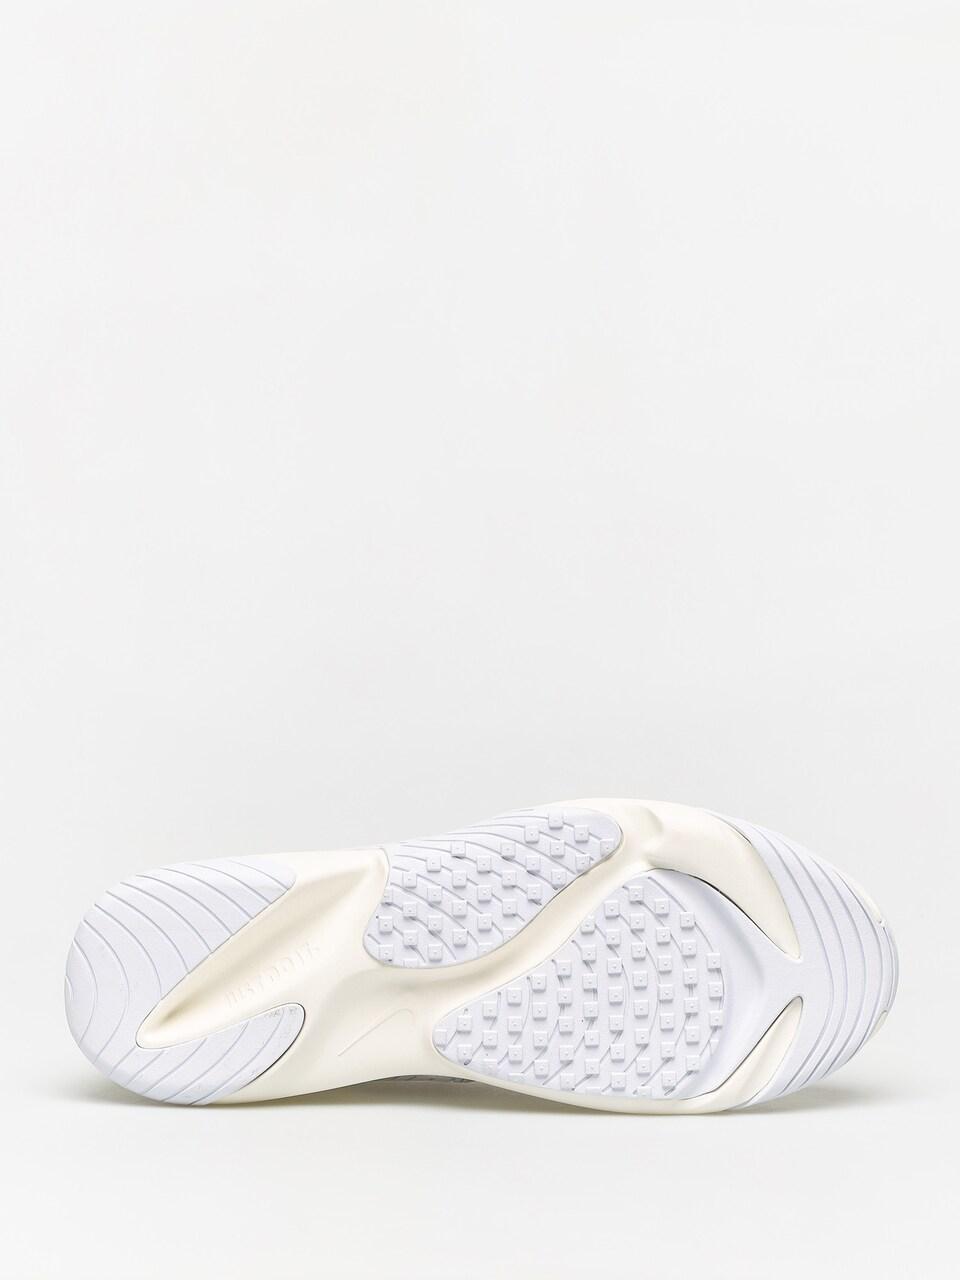 Buty Nike Zoom 2K (sailwhite black)